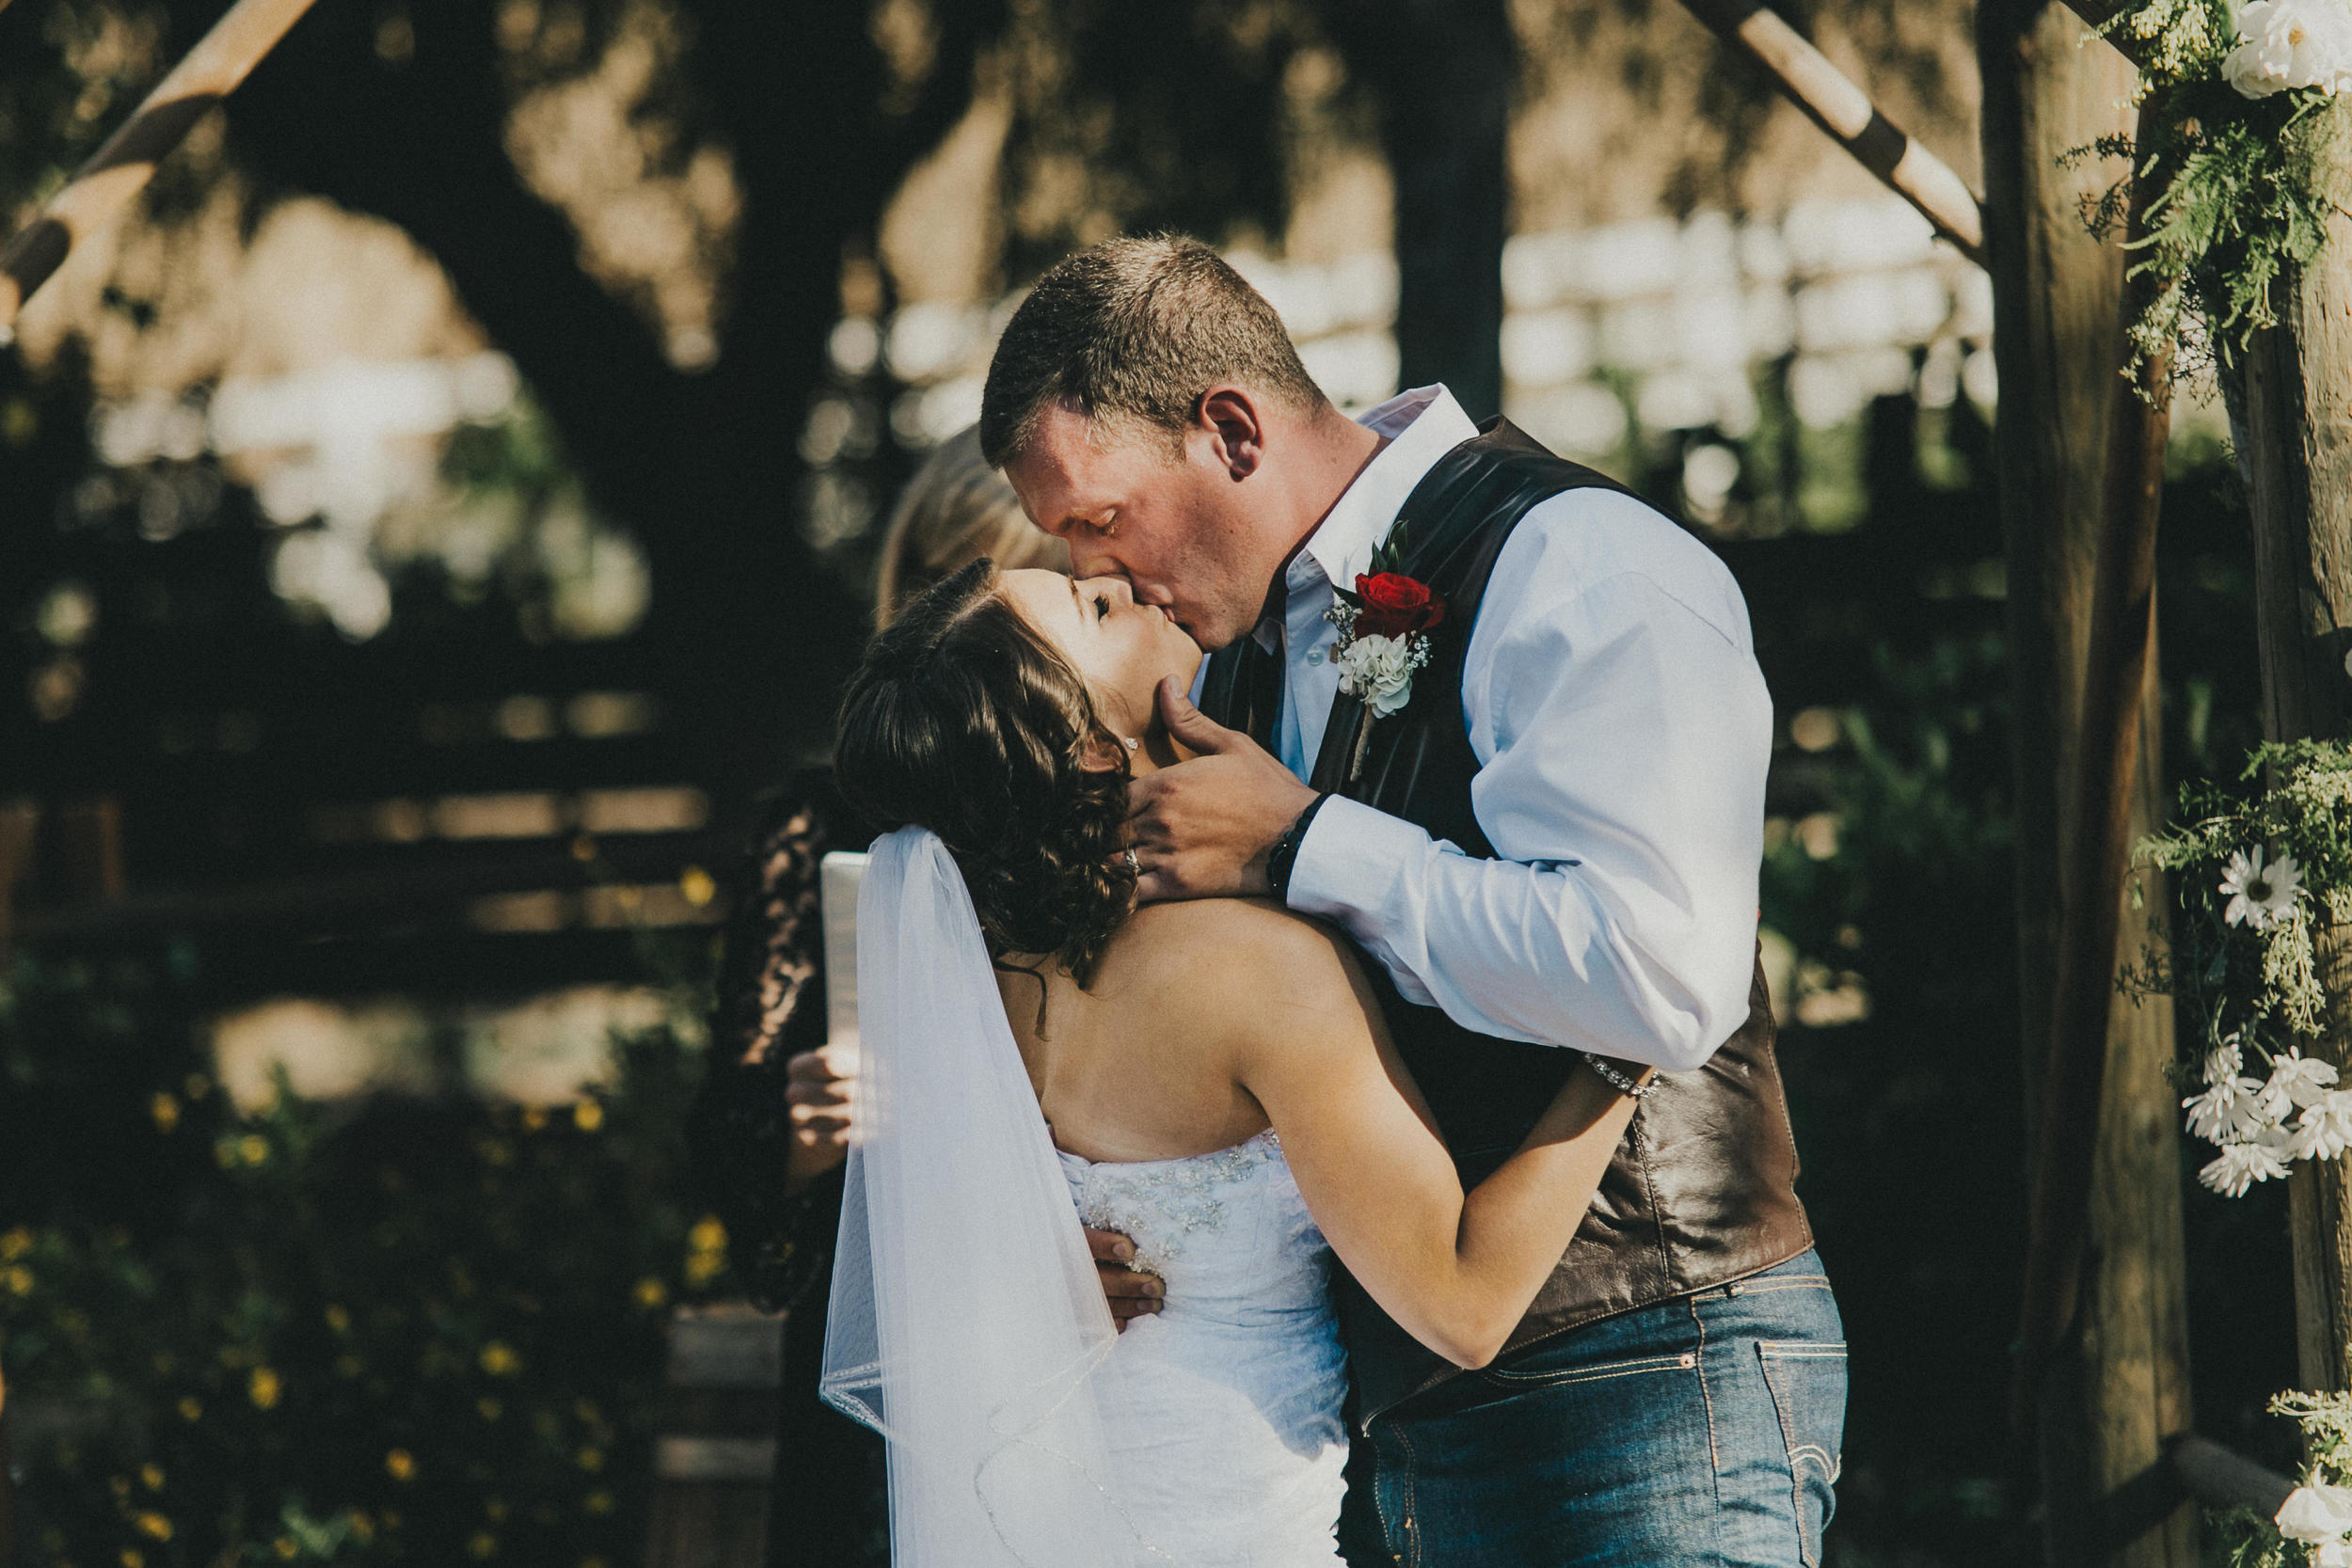 Cheyenne + Jordan - Wedding, Natalie Griffo (56 of 157).jpg